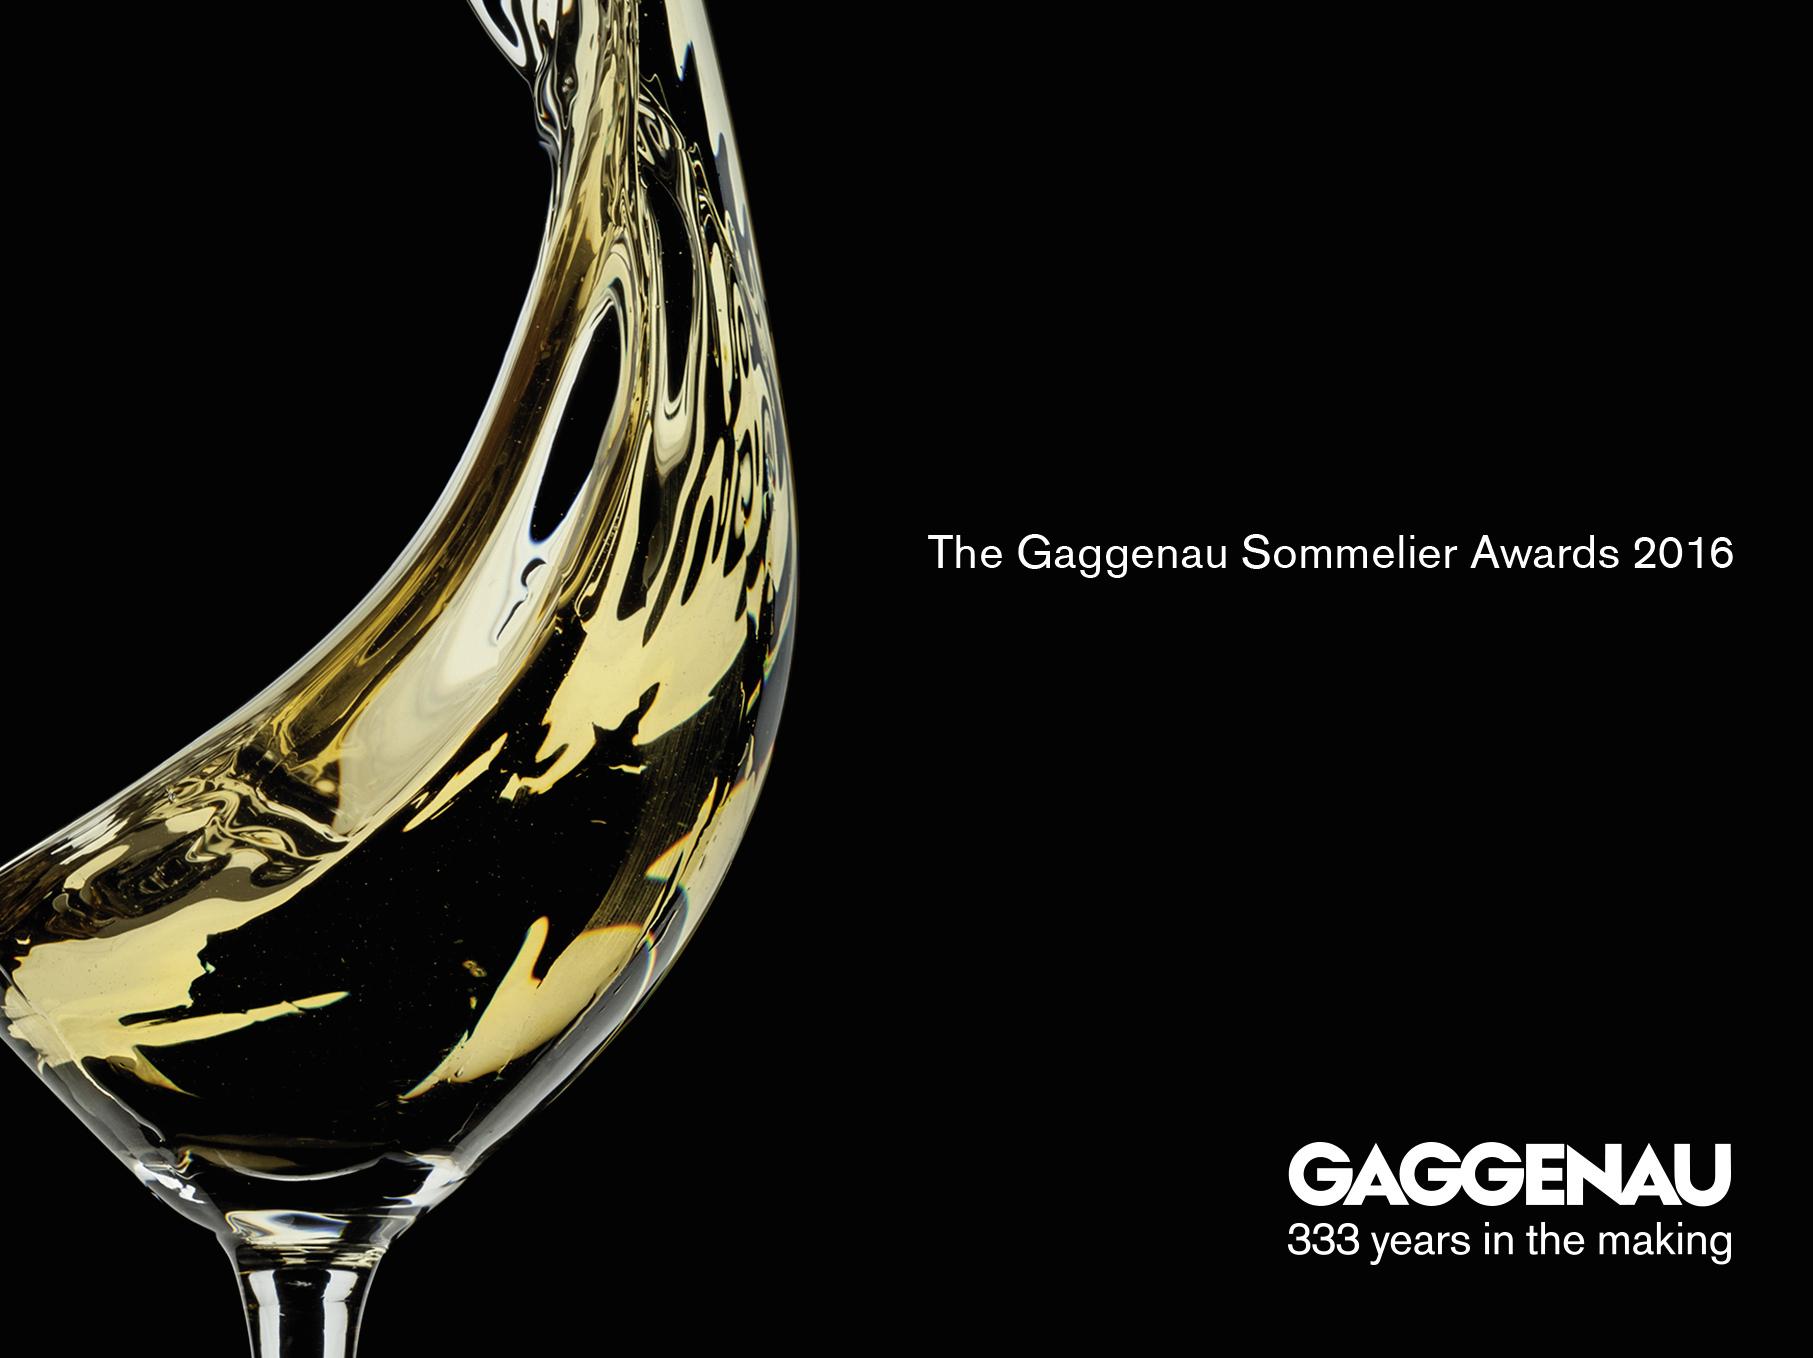 Marc Almert gewinnt Gaggenau Sommelier Awards